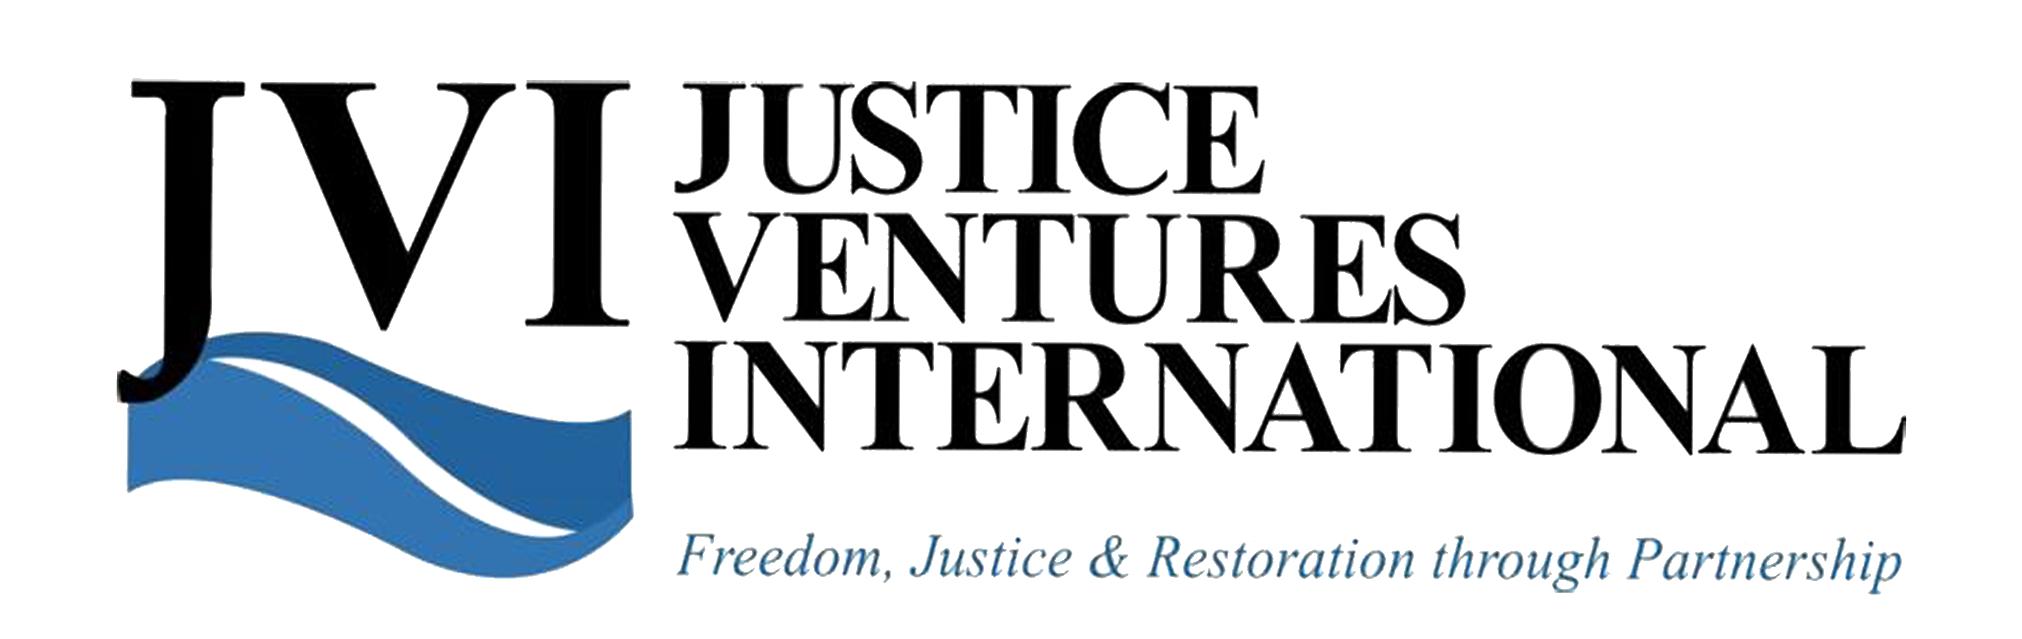 Justice Ventures International